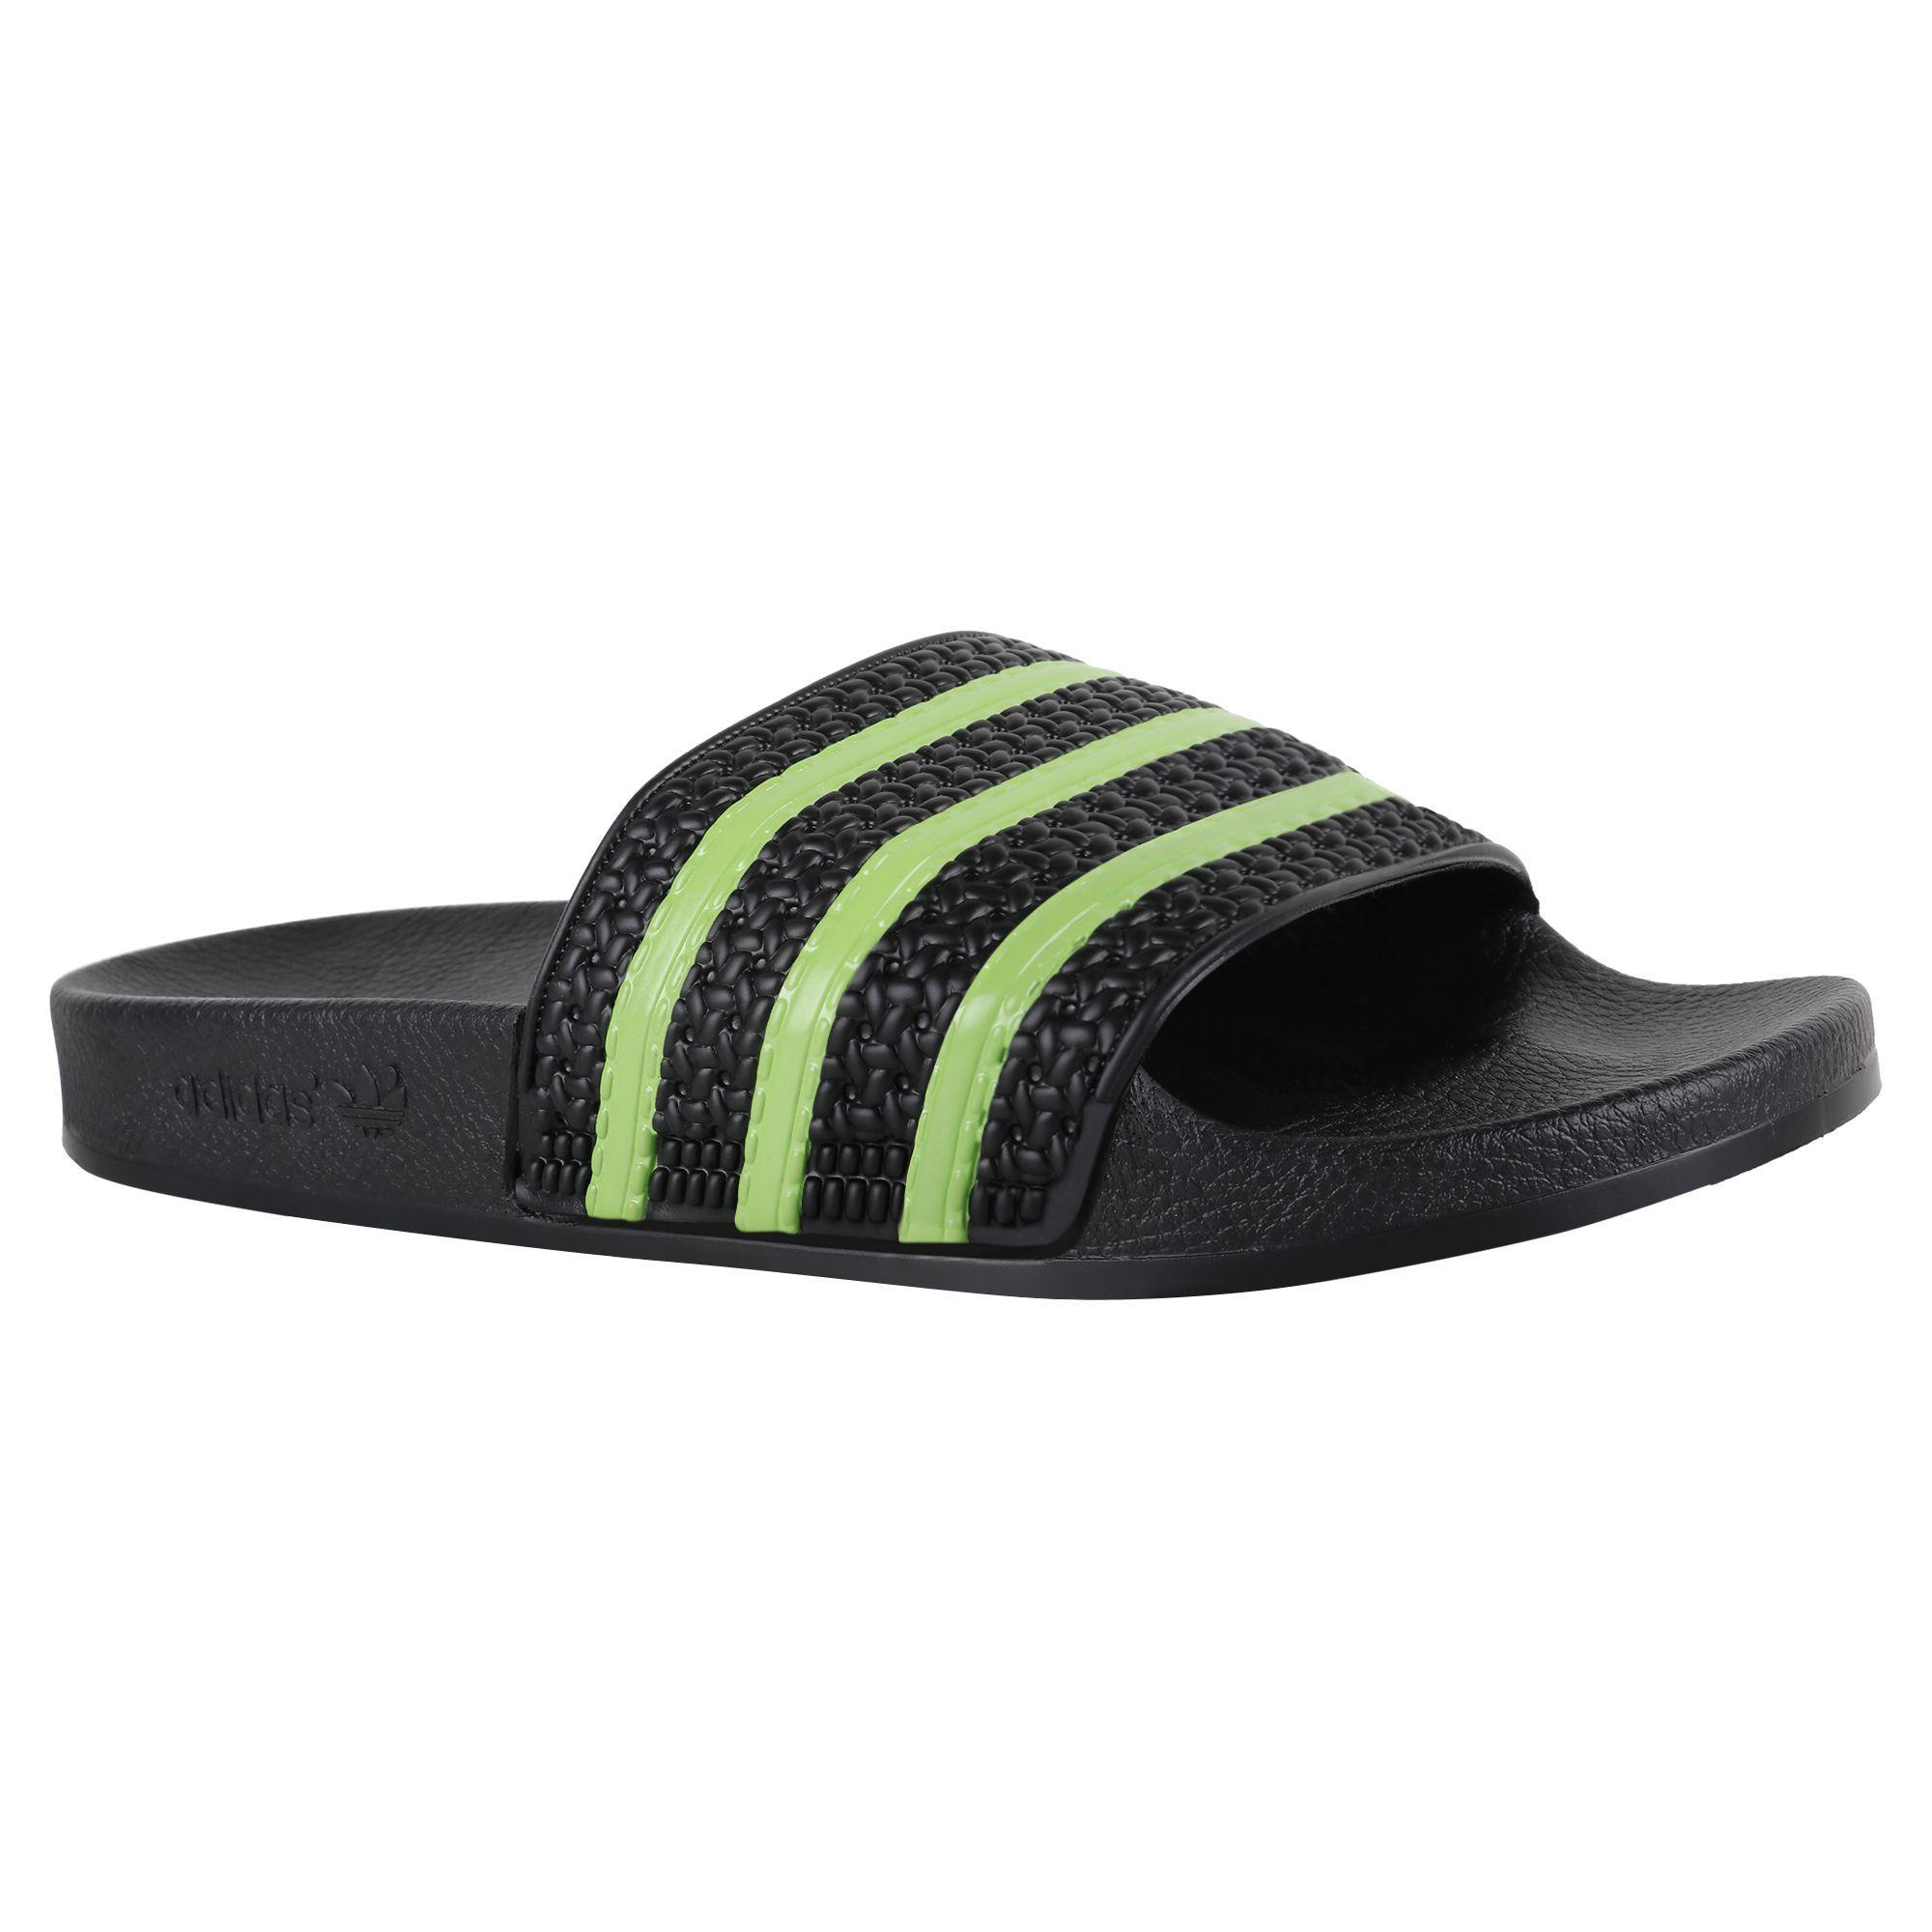 79a764b5b867aa Adidas ADILETTE Black Slide Flip flop Adidas ADILETTE Black Slide Flip flop  ...